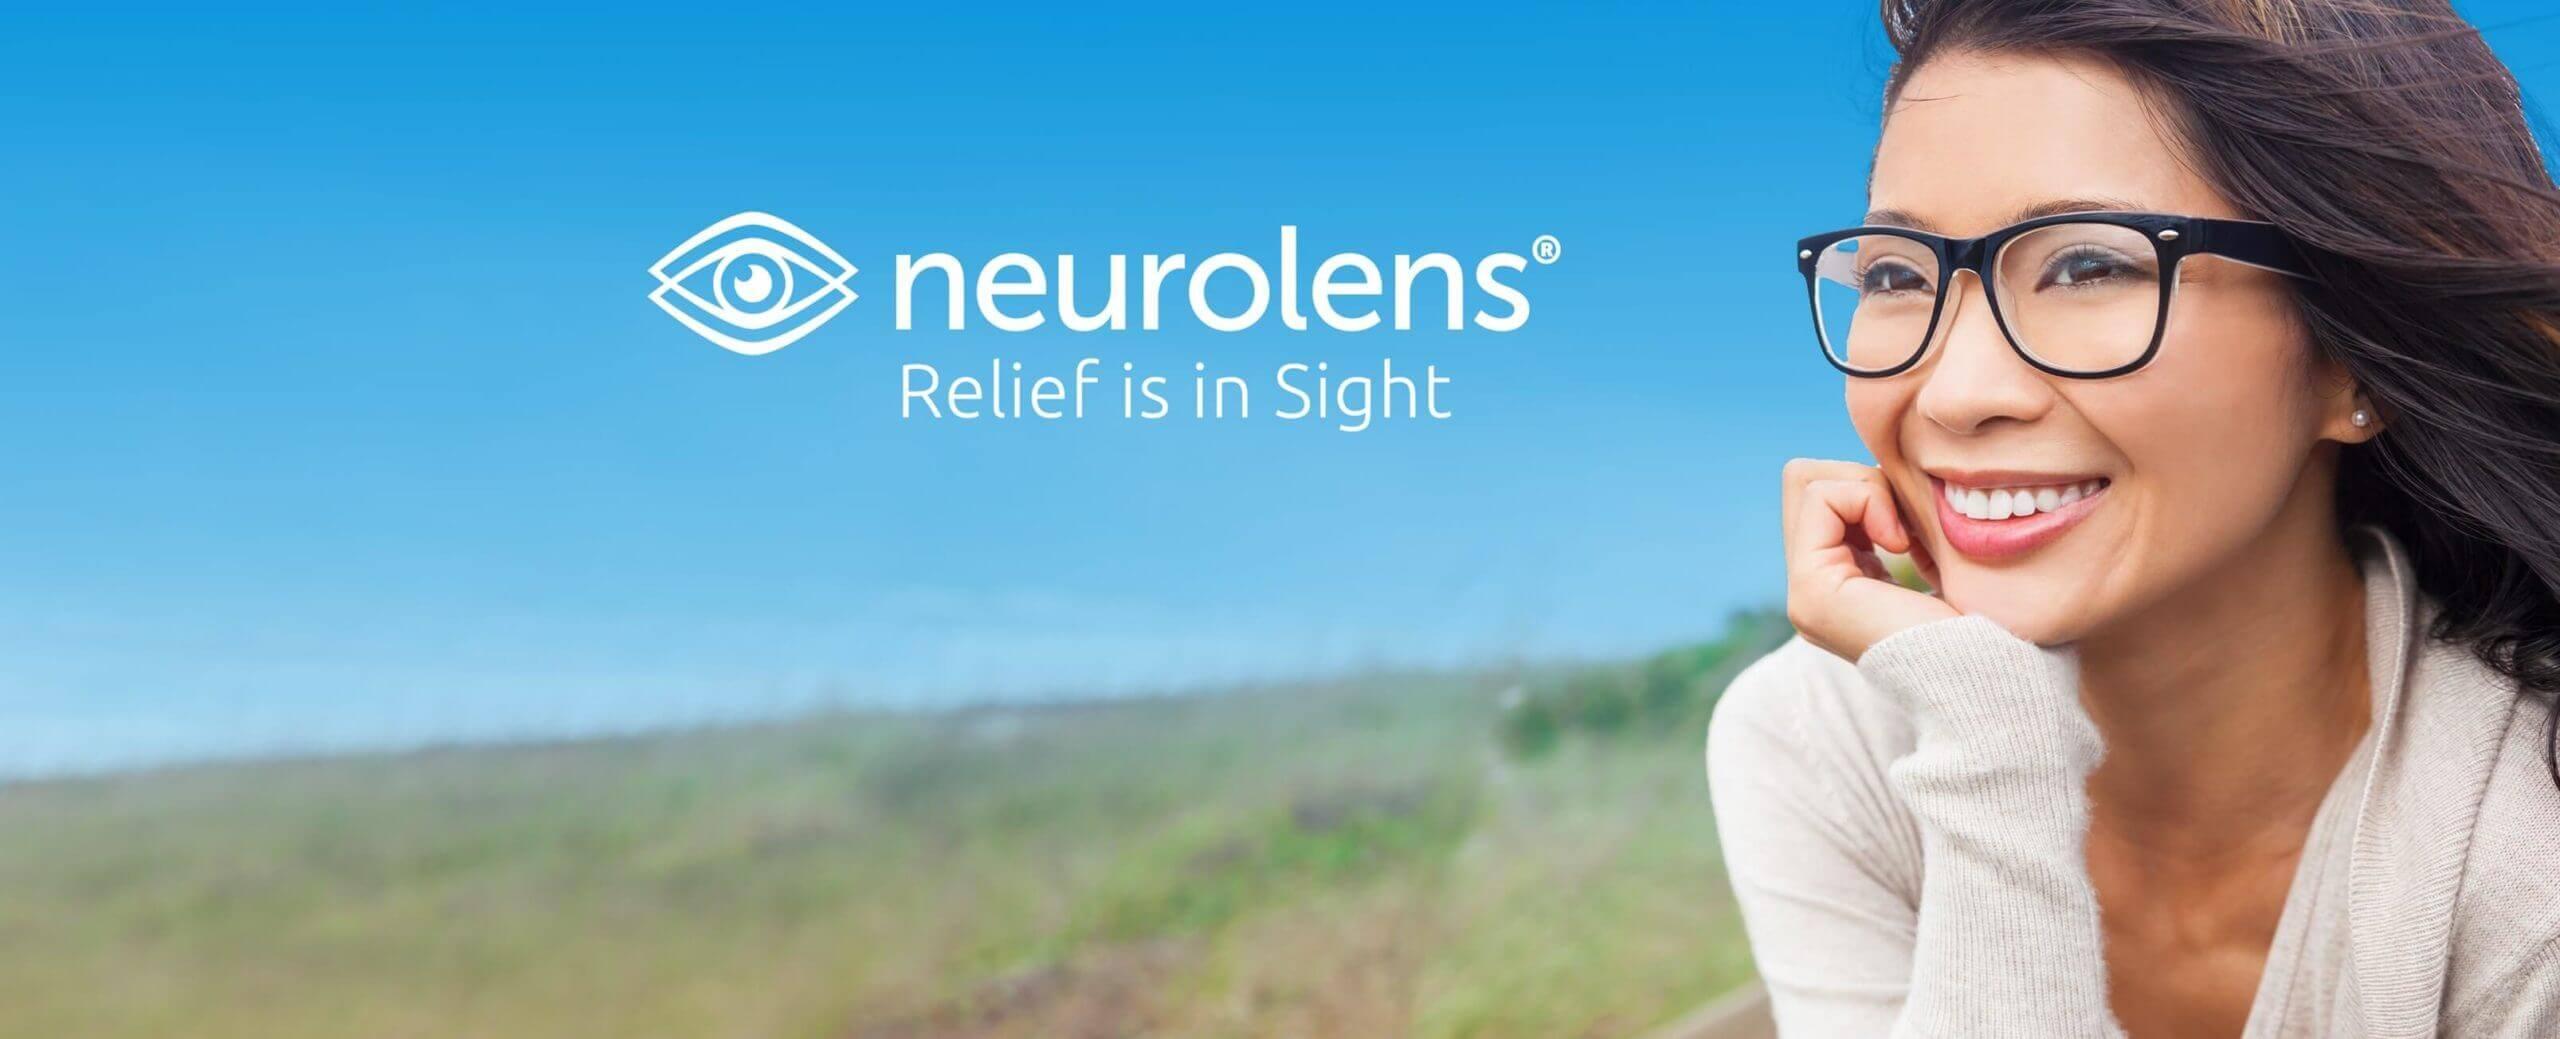 neurolens banner image scaled.jpg